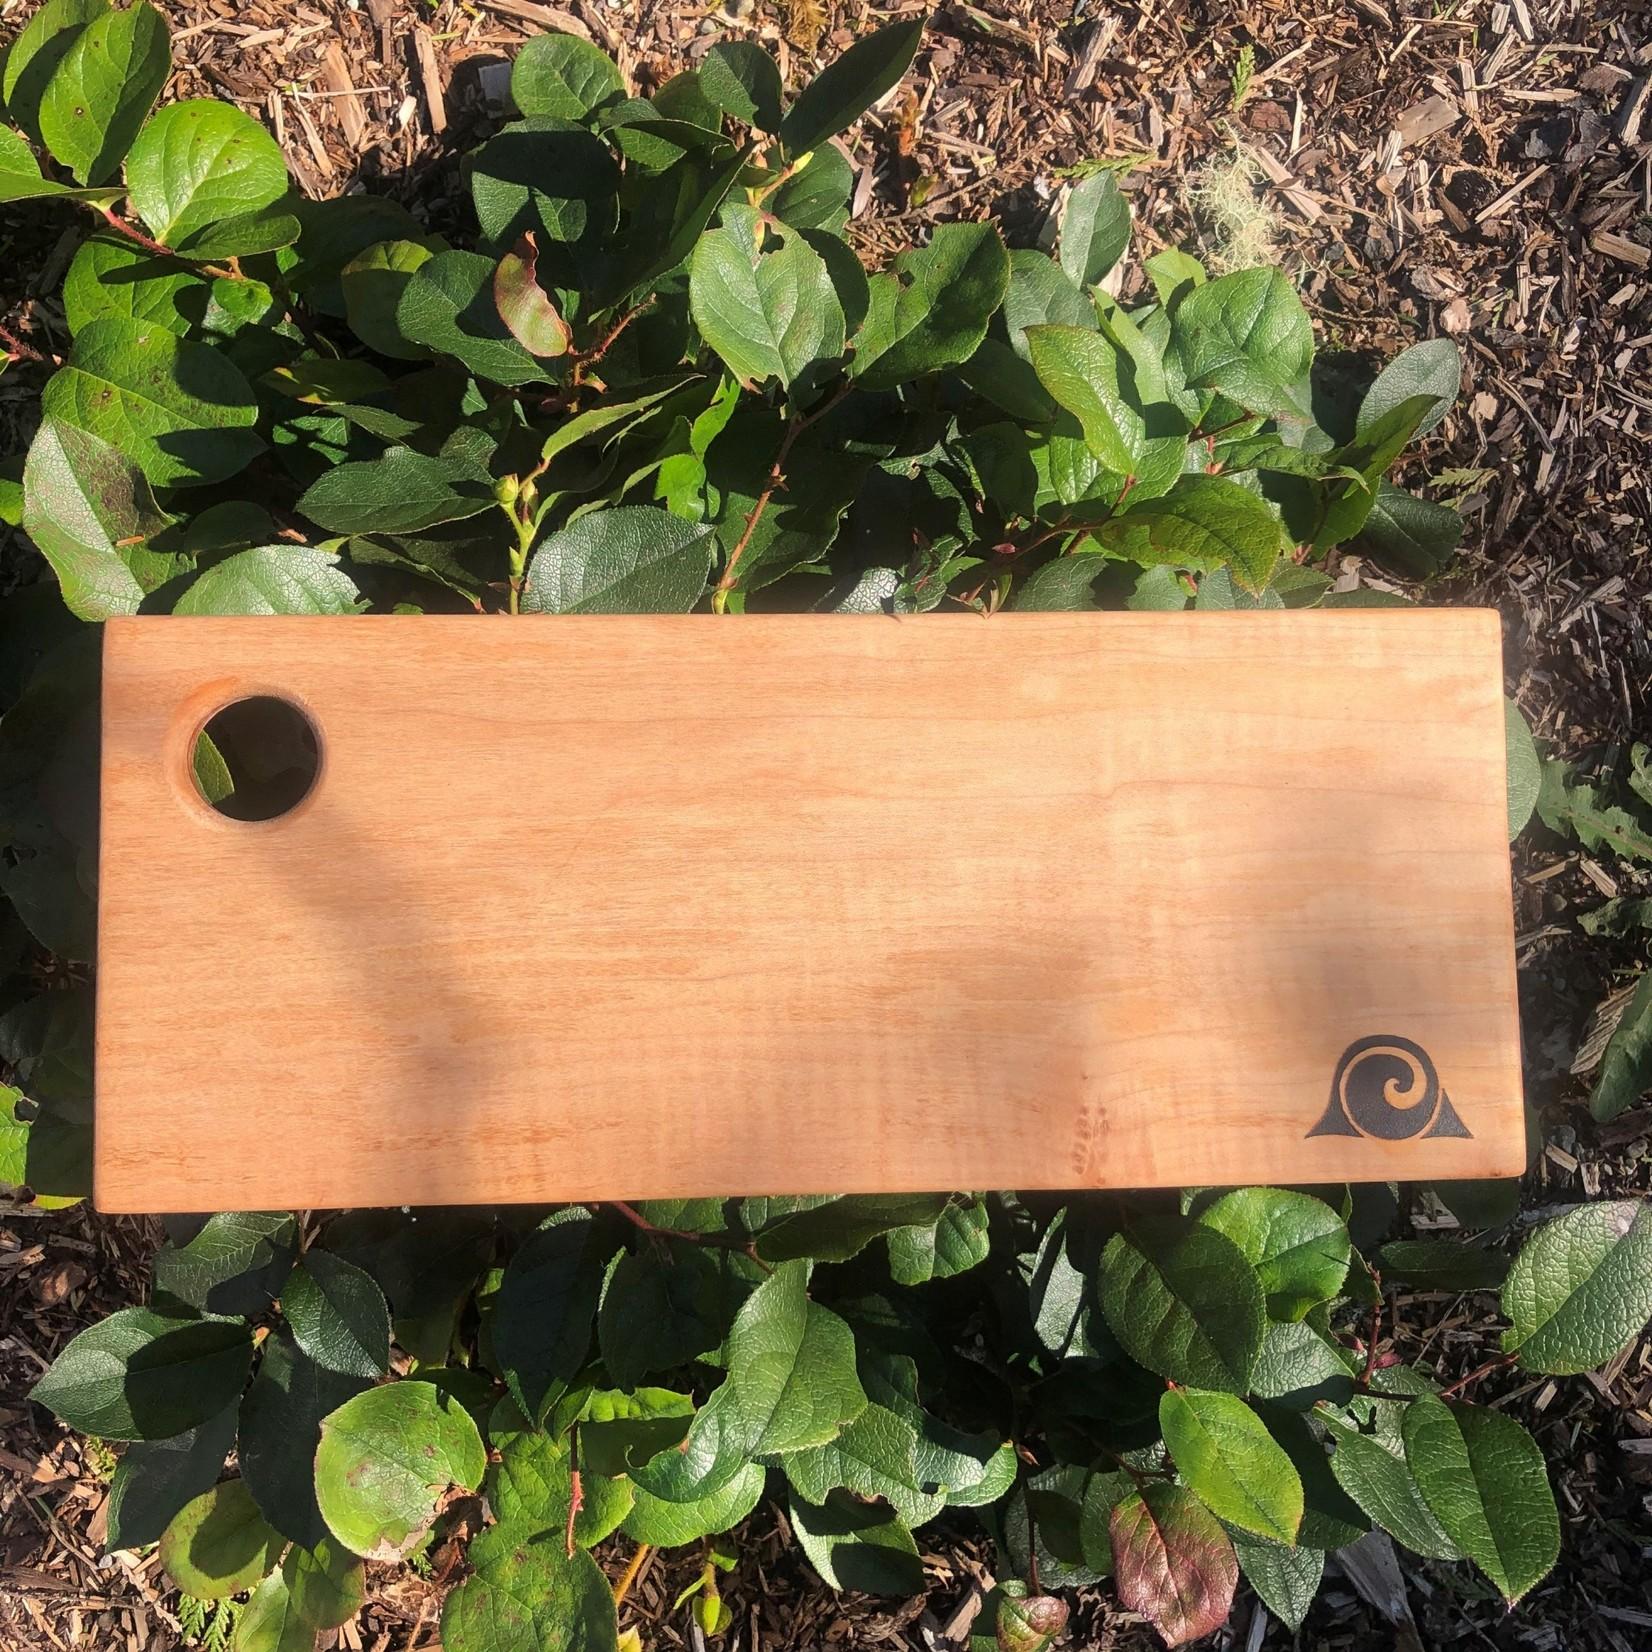 Tofino Wood Works cutting board small rectangle